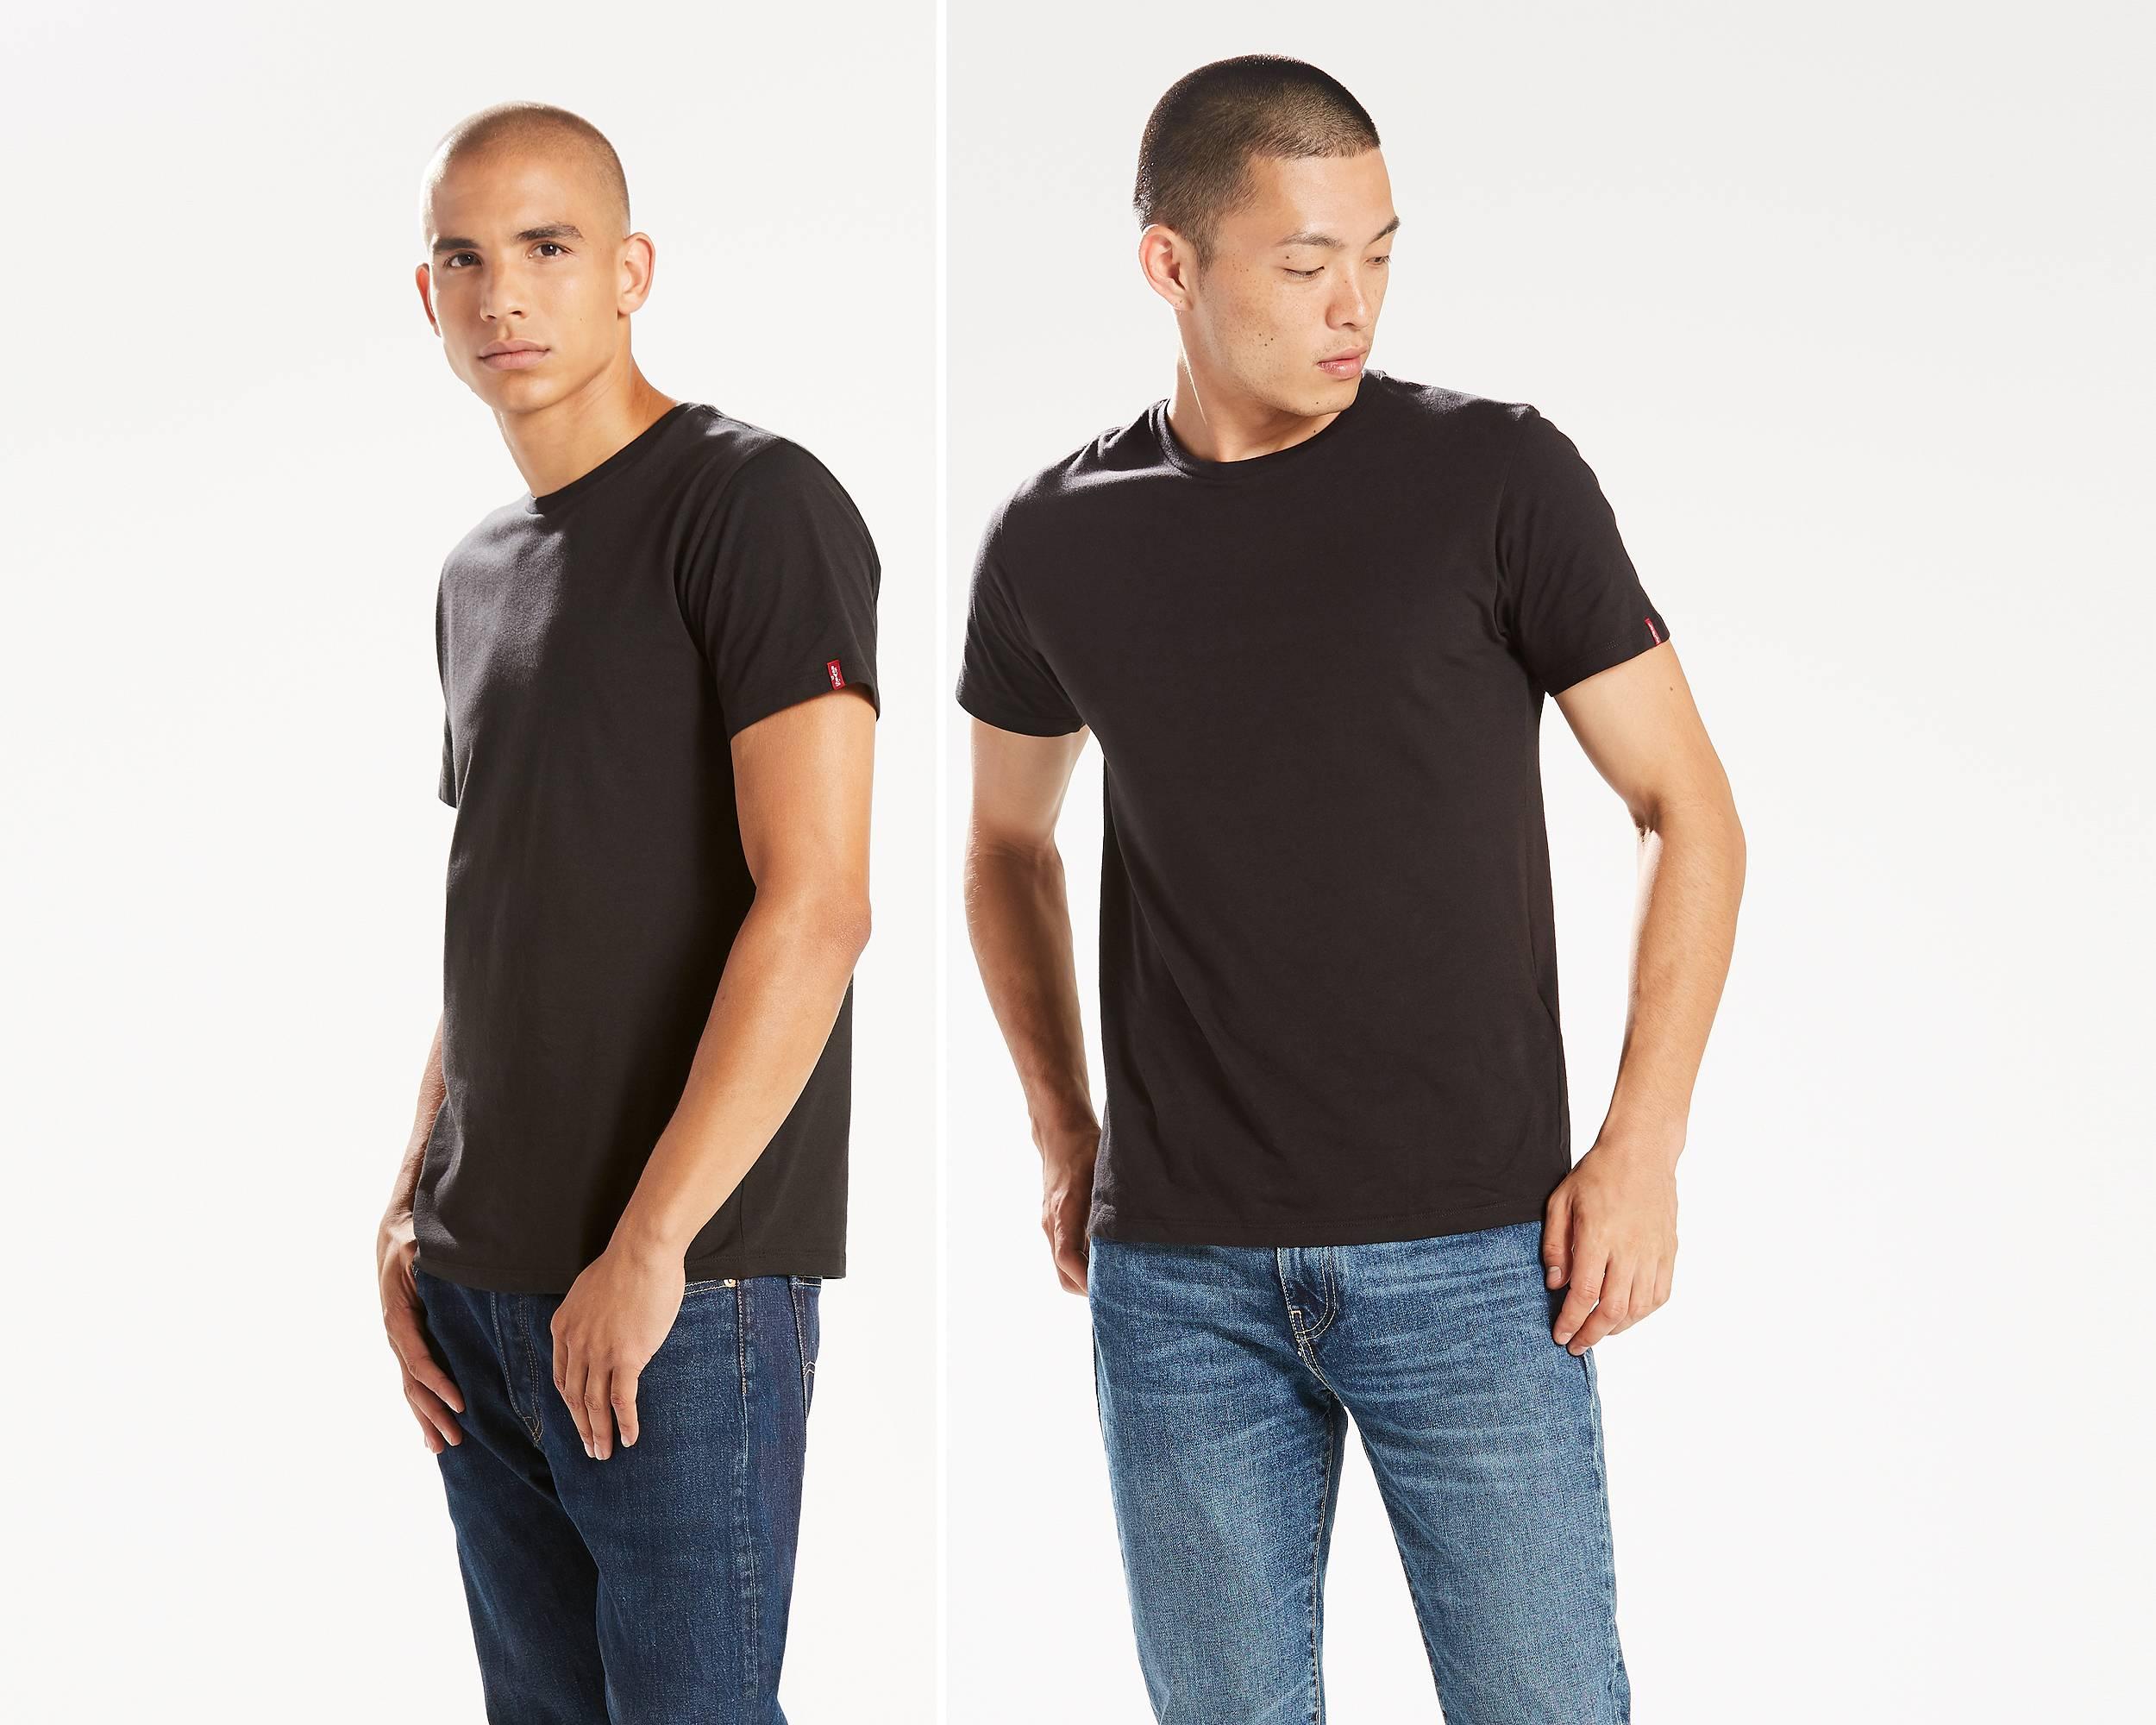 Leg day t shirts men s polo shirt slim - Quick View